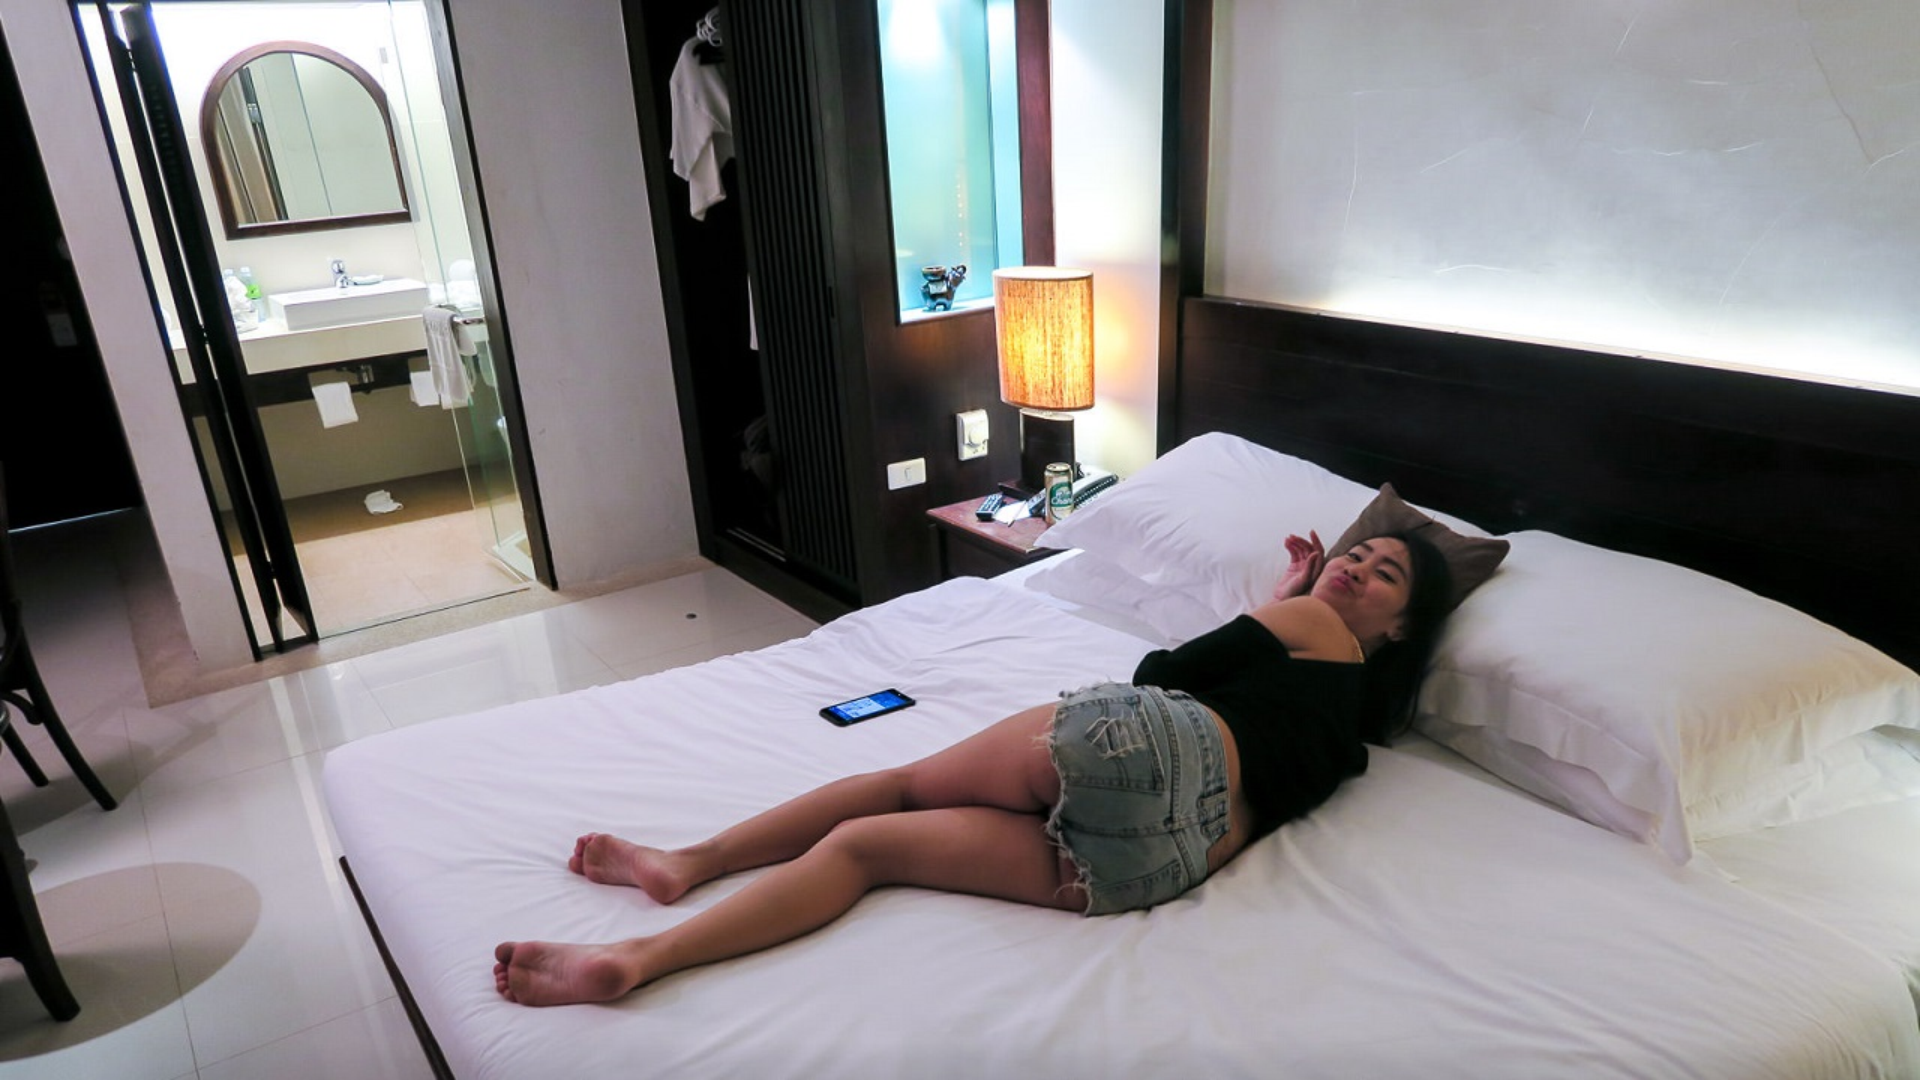 Guest Friendly Hotels Bangkok